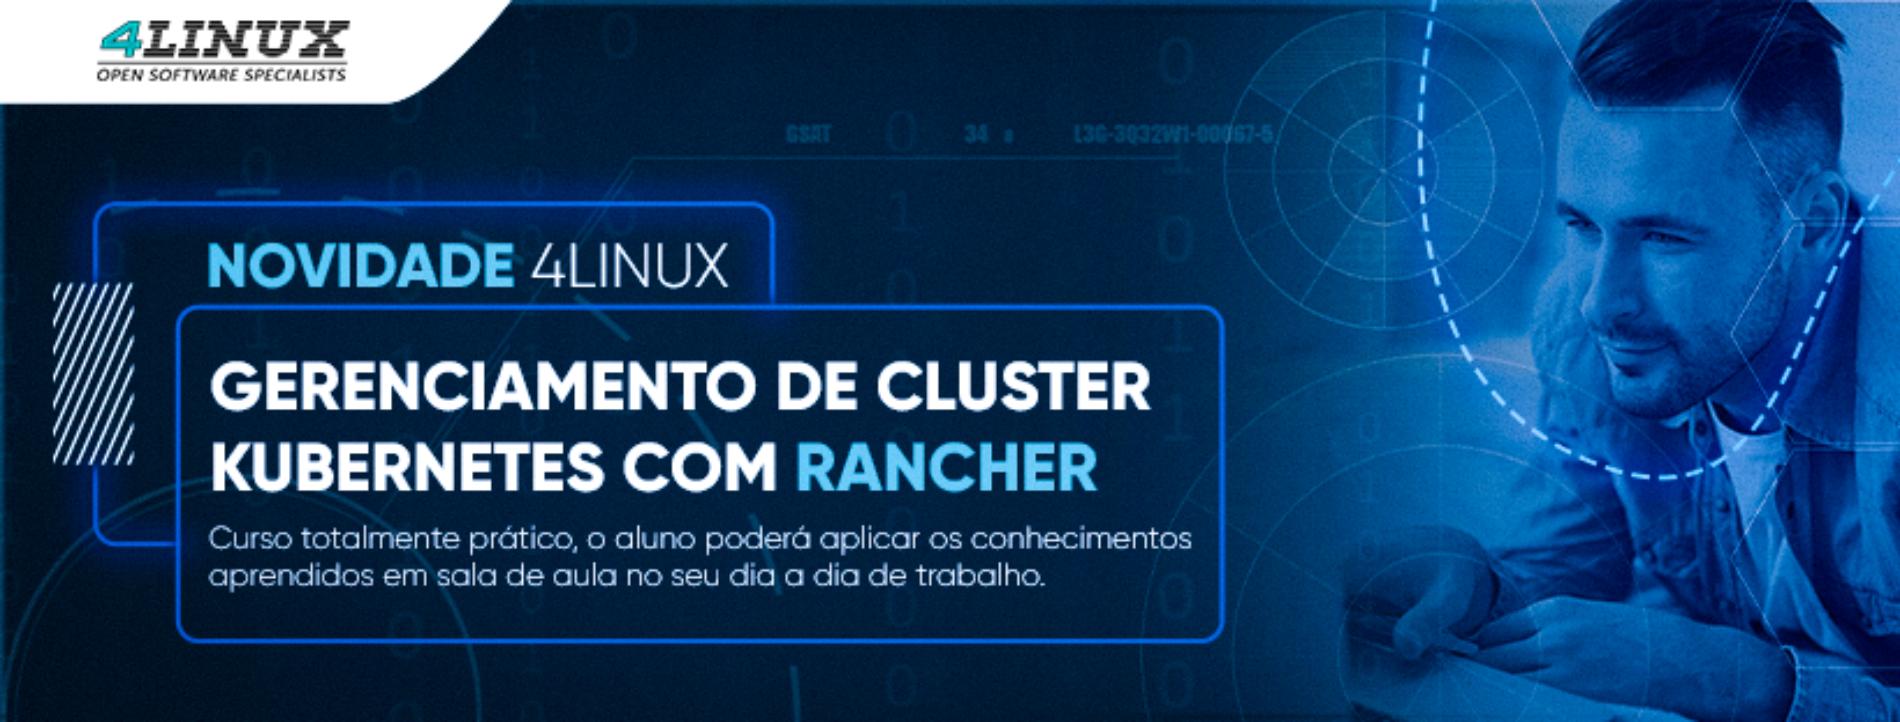 4Linux lança novo curso de Rancher!